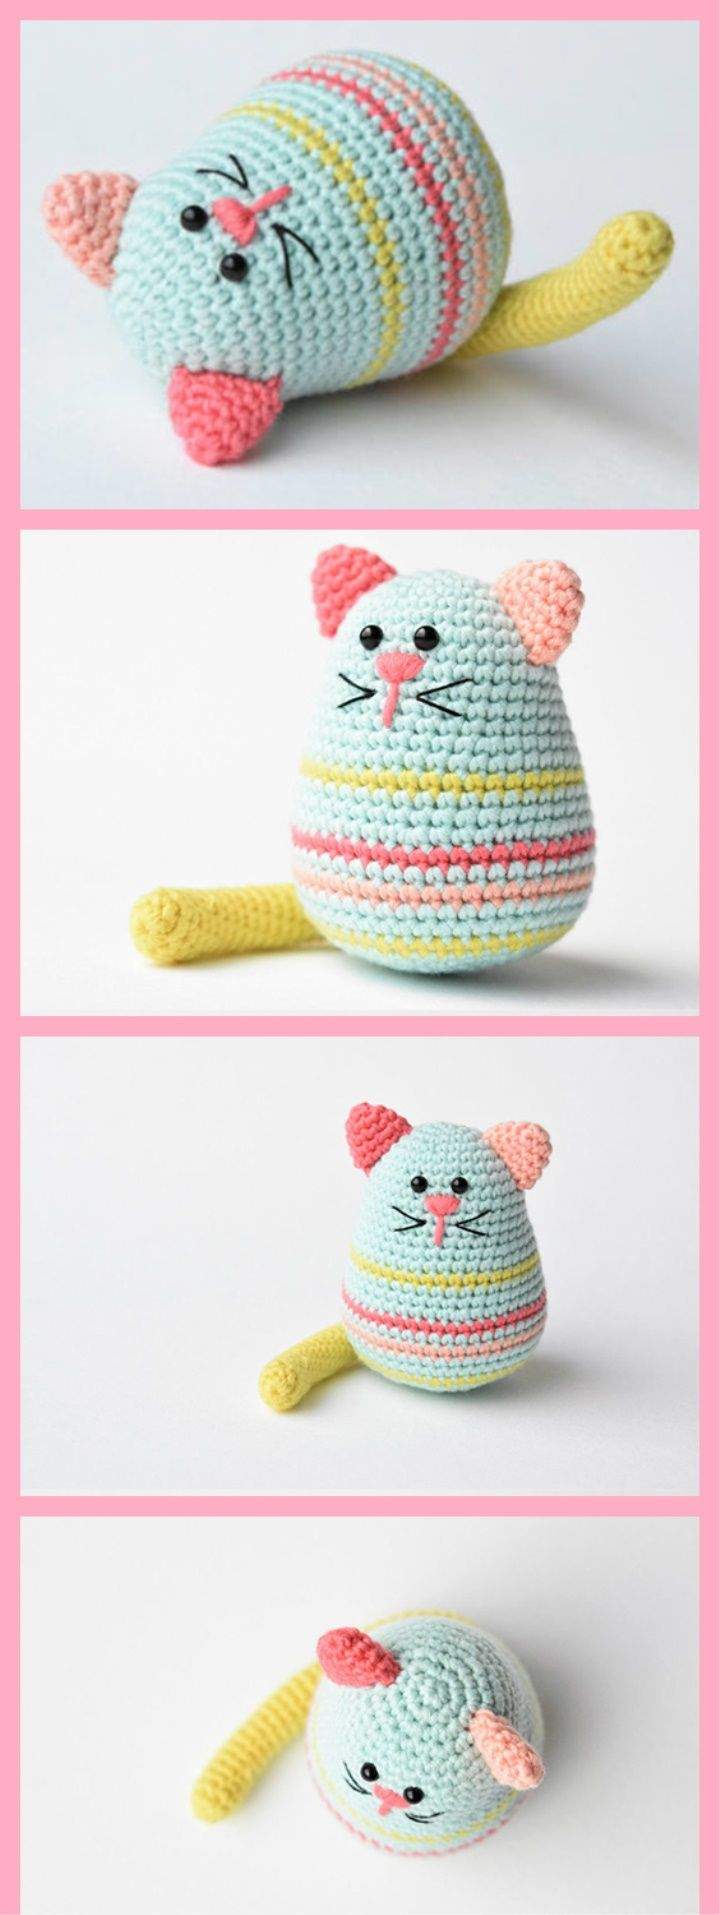 1464 best amigurumi images on Pinterest | Crochet toys, Amigurumi ...